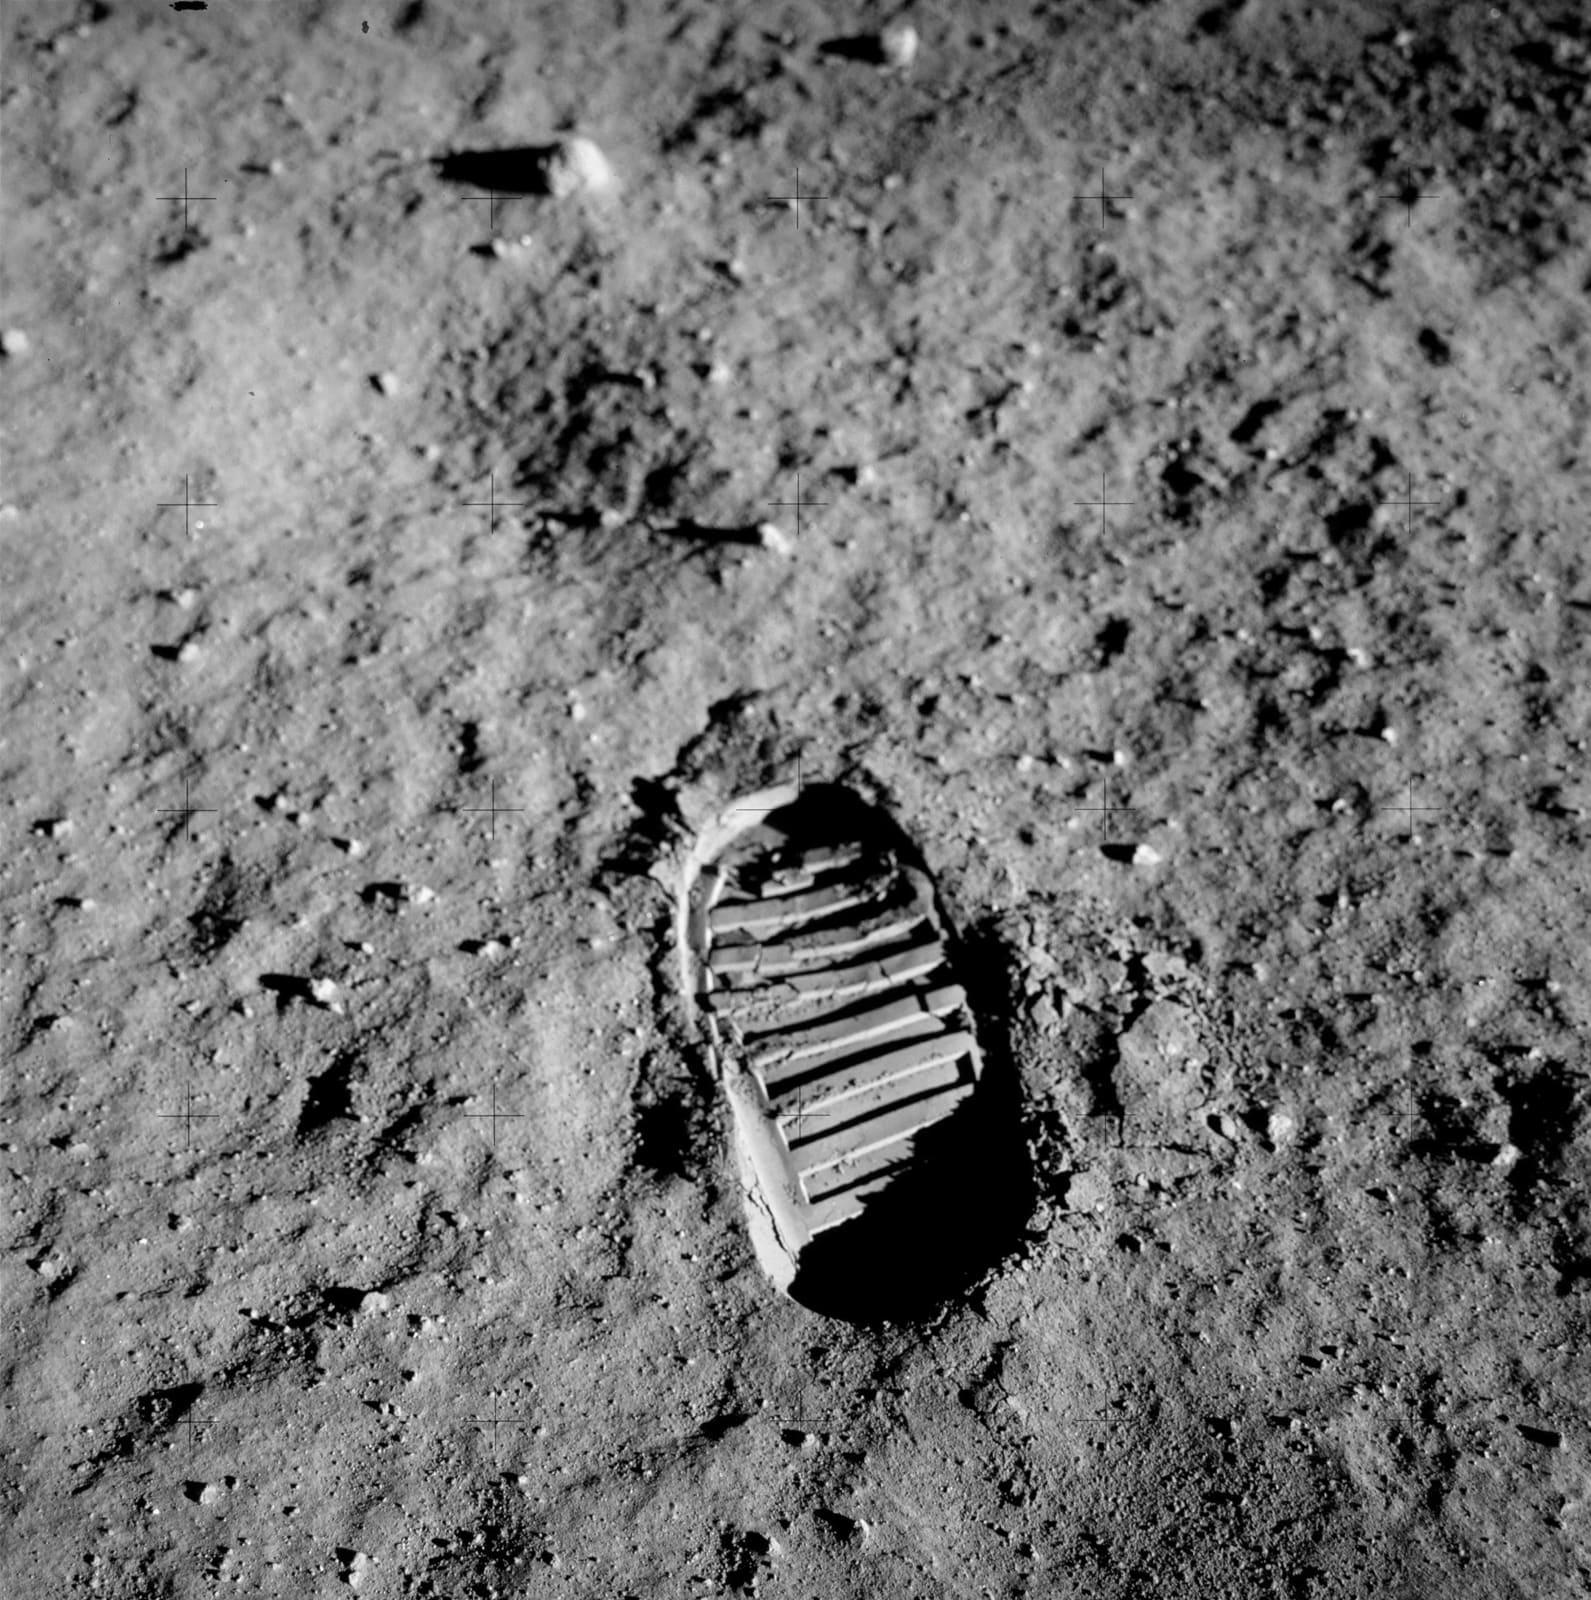 NASA (Crew of Apollo 11 - Buzz Aldrin) Bootprint, July 1969 vintage chromogenic print published by NASA 18 x 18 cm (image)38 x 37 cm (framed)